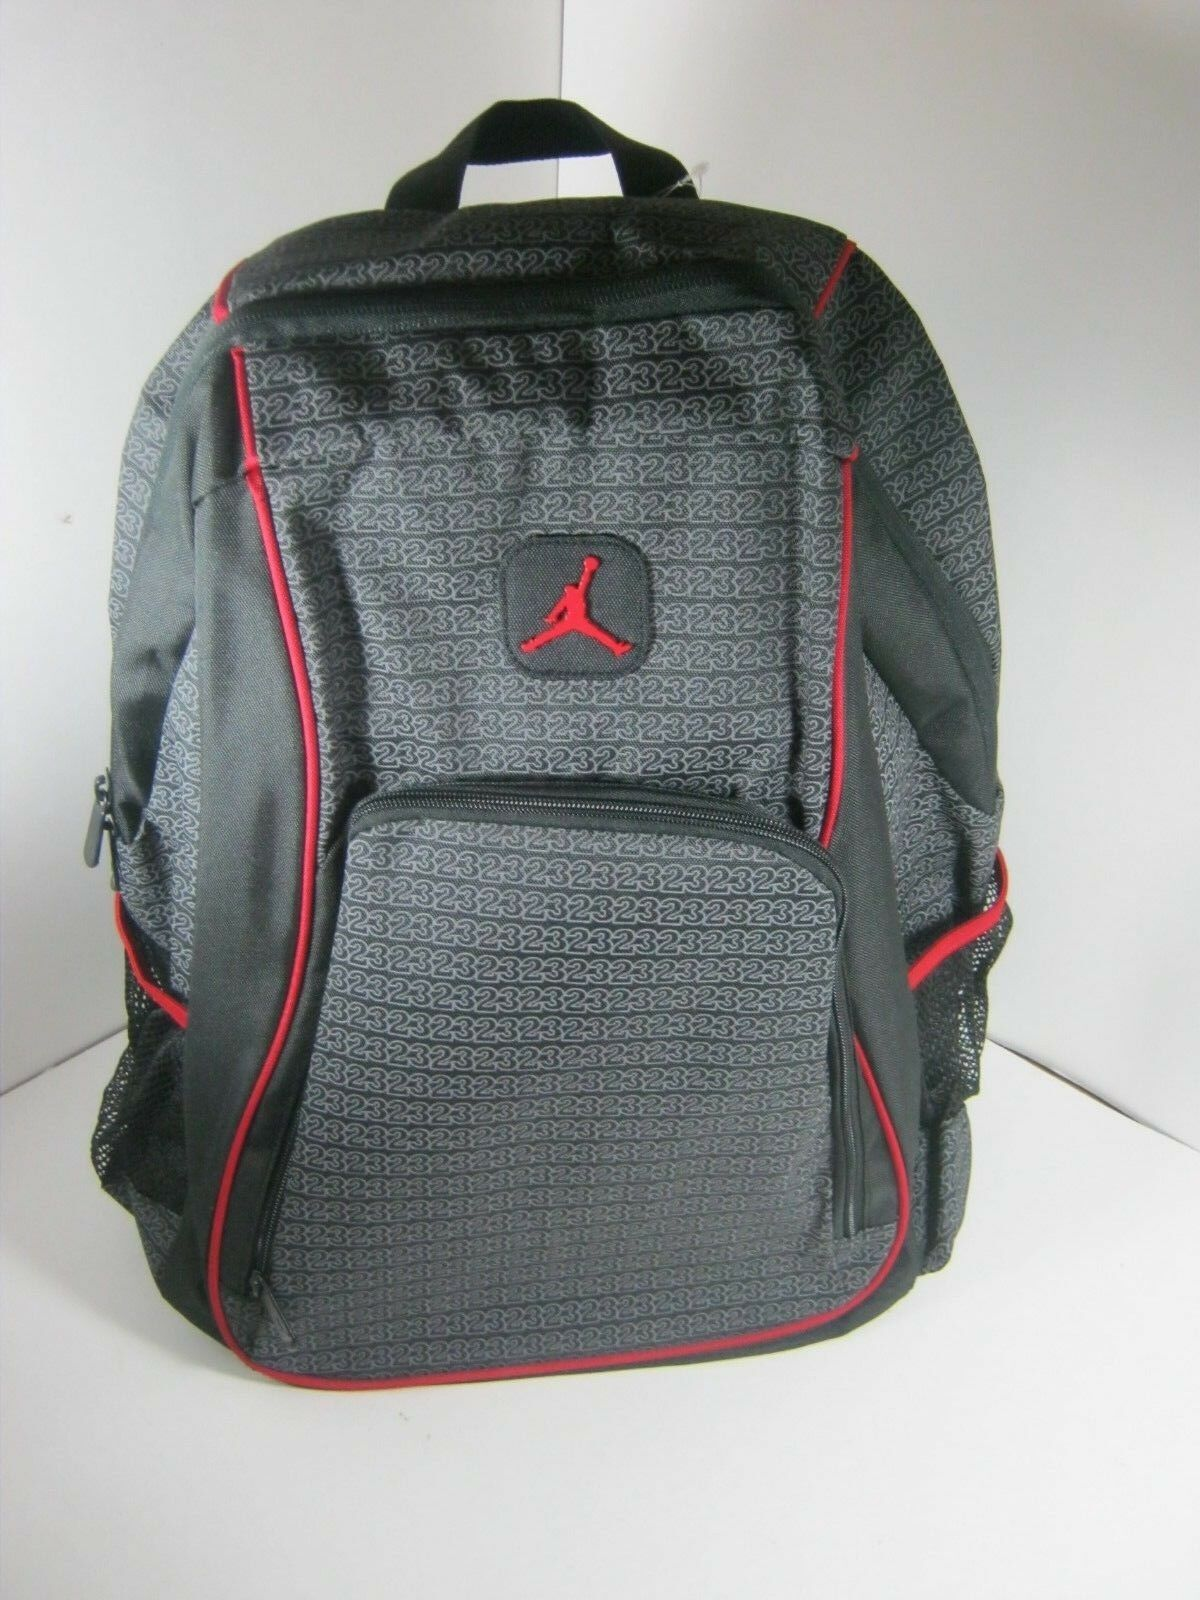 Nike Air Jordan Jumpman 23 Logo Backpack Laptop 9a1223 023 Black Red ... 32a5f68e5e172